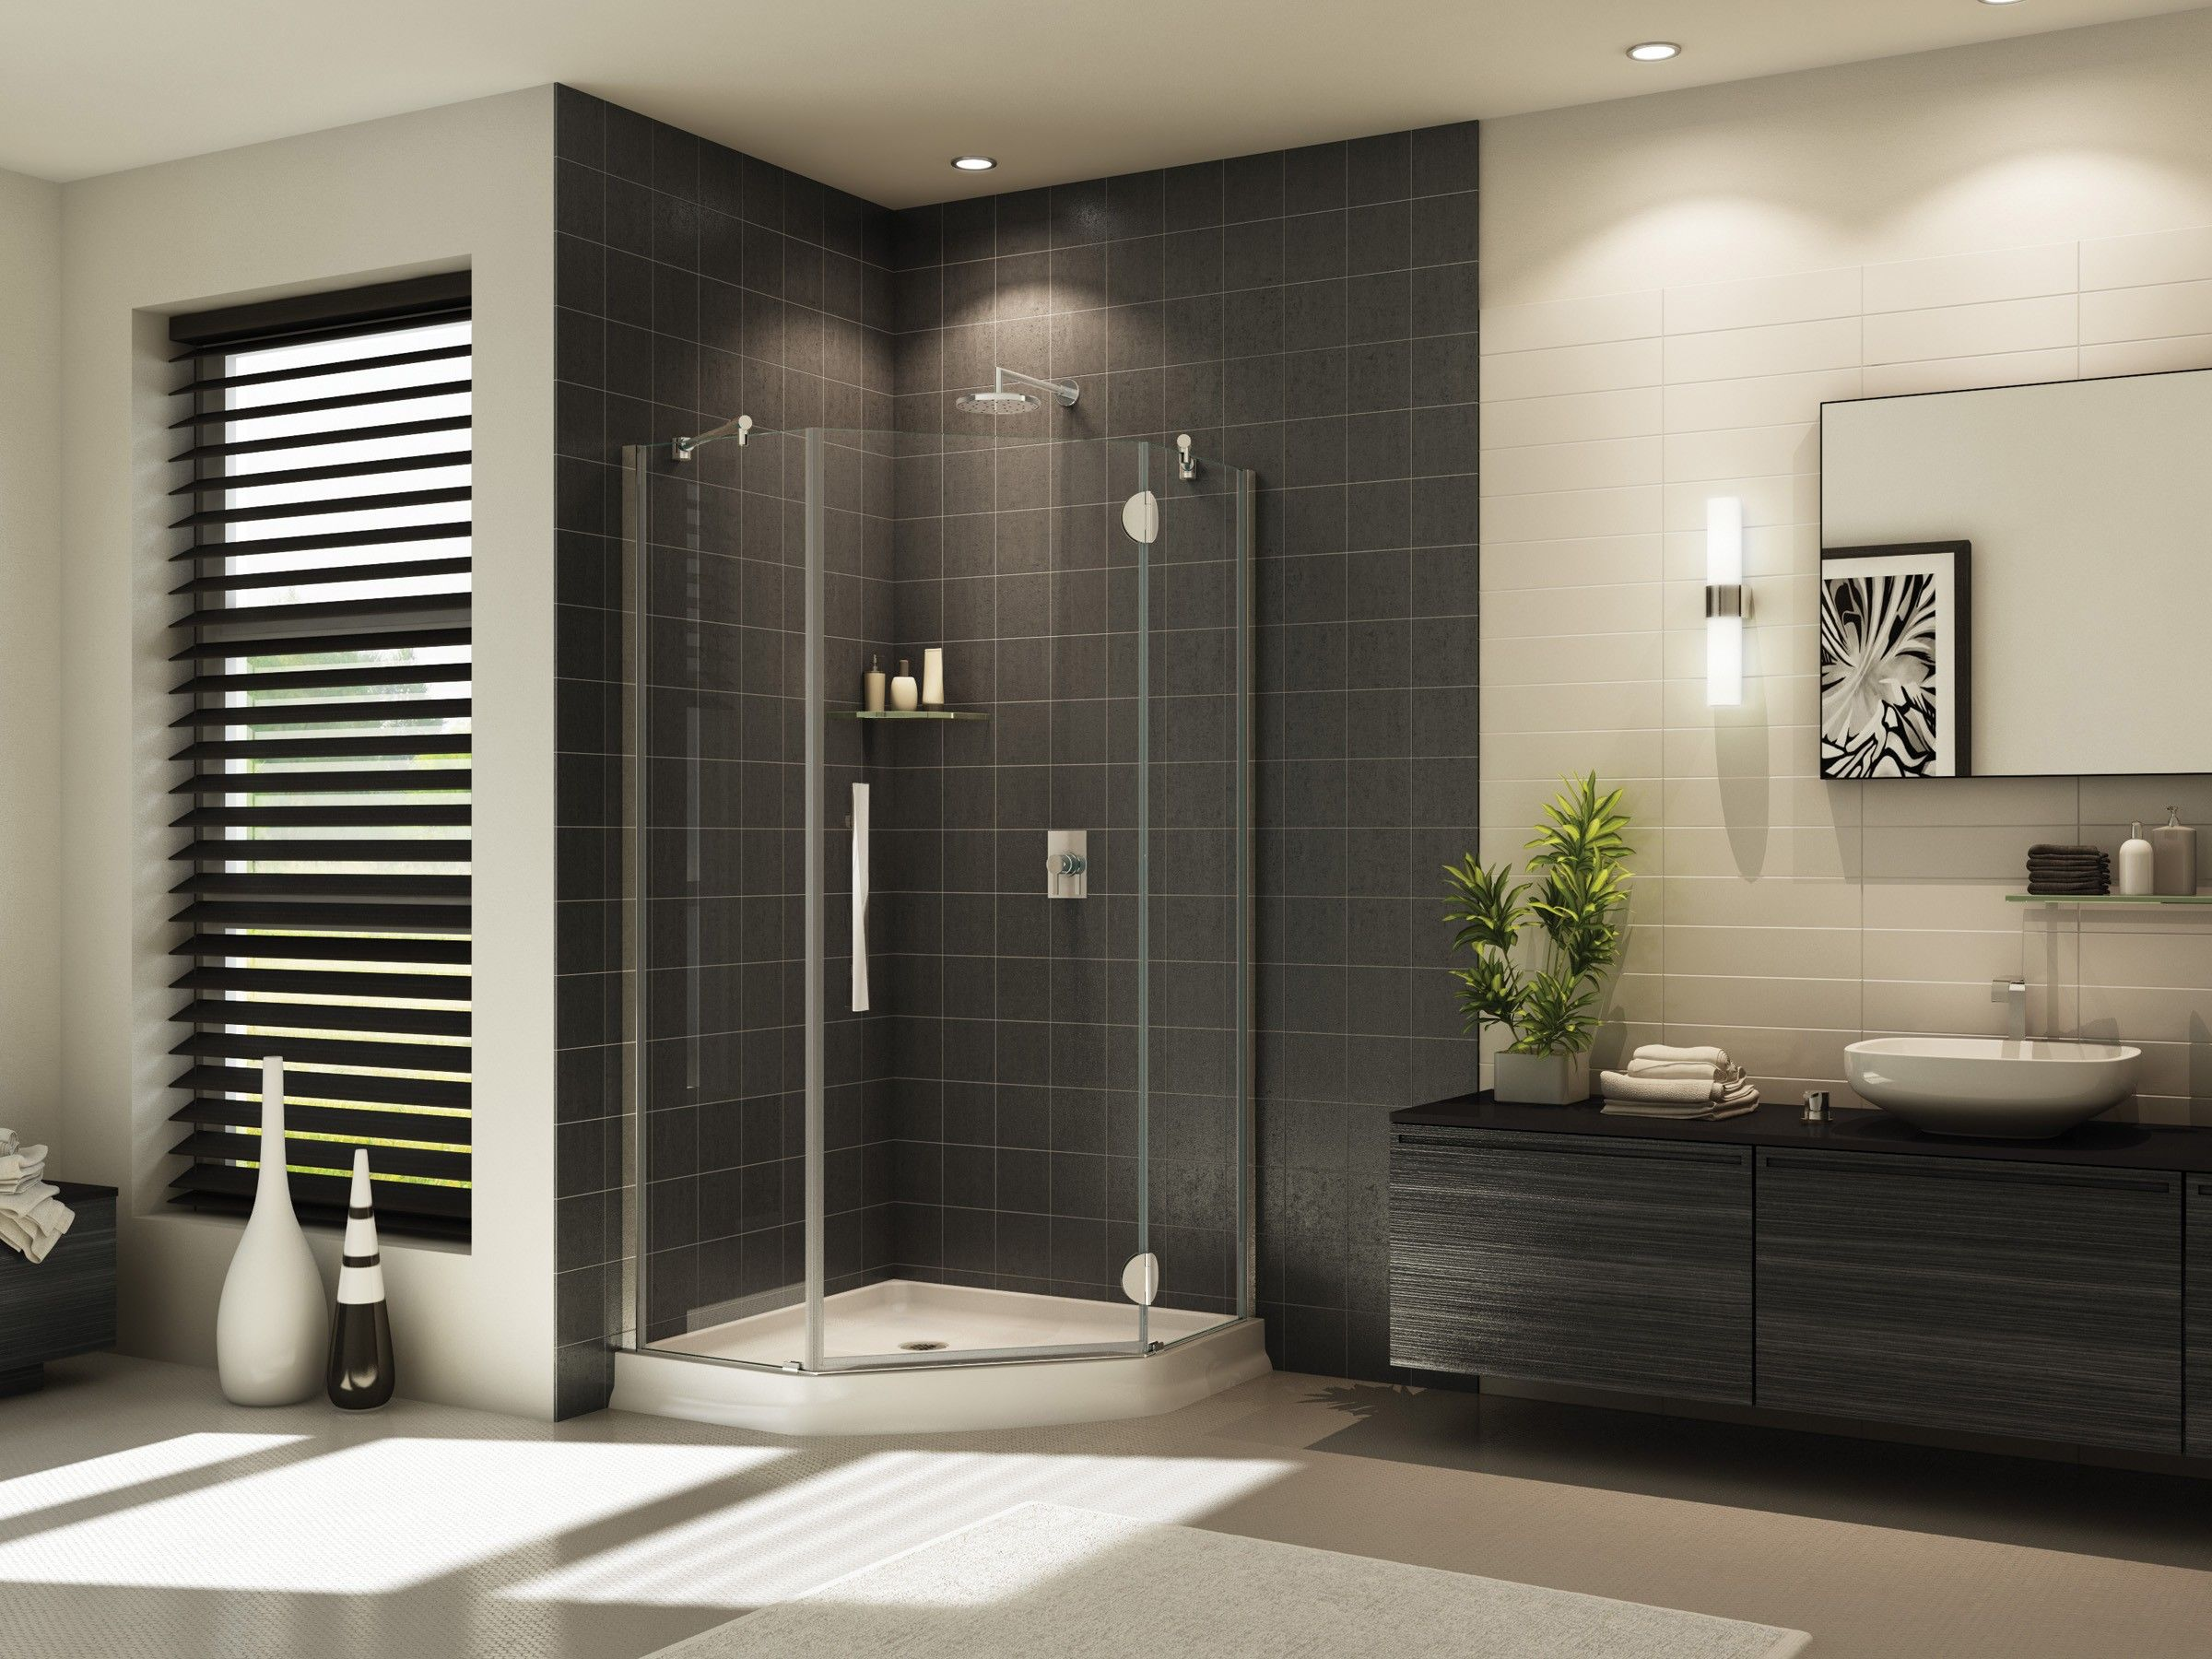 Fleurco Platinum Neo 42 X 42 Neo Angle Shower Door Glass To